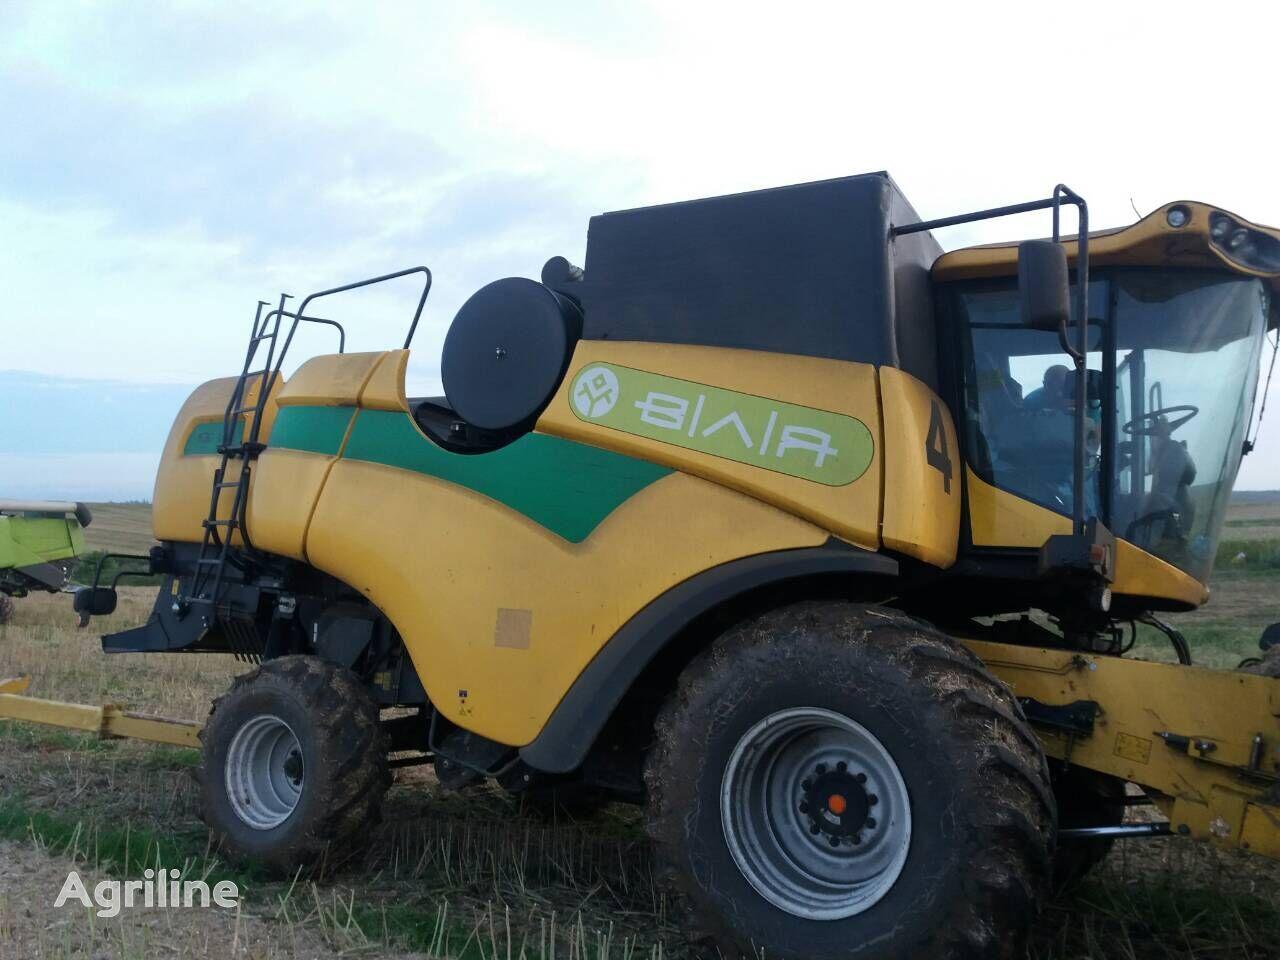 NEW HOLLAND CX6090 grain harvester